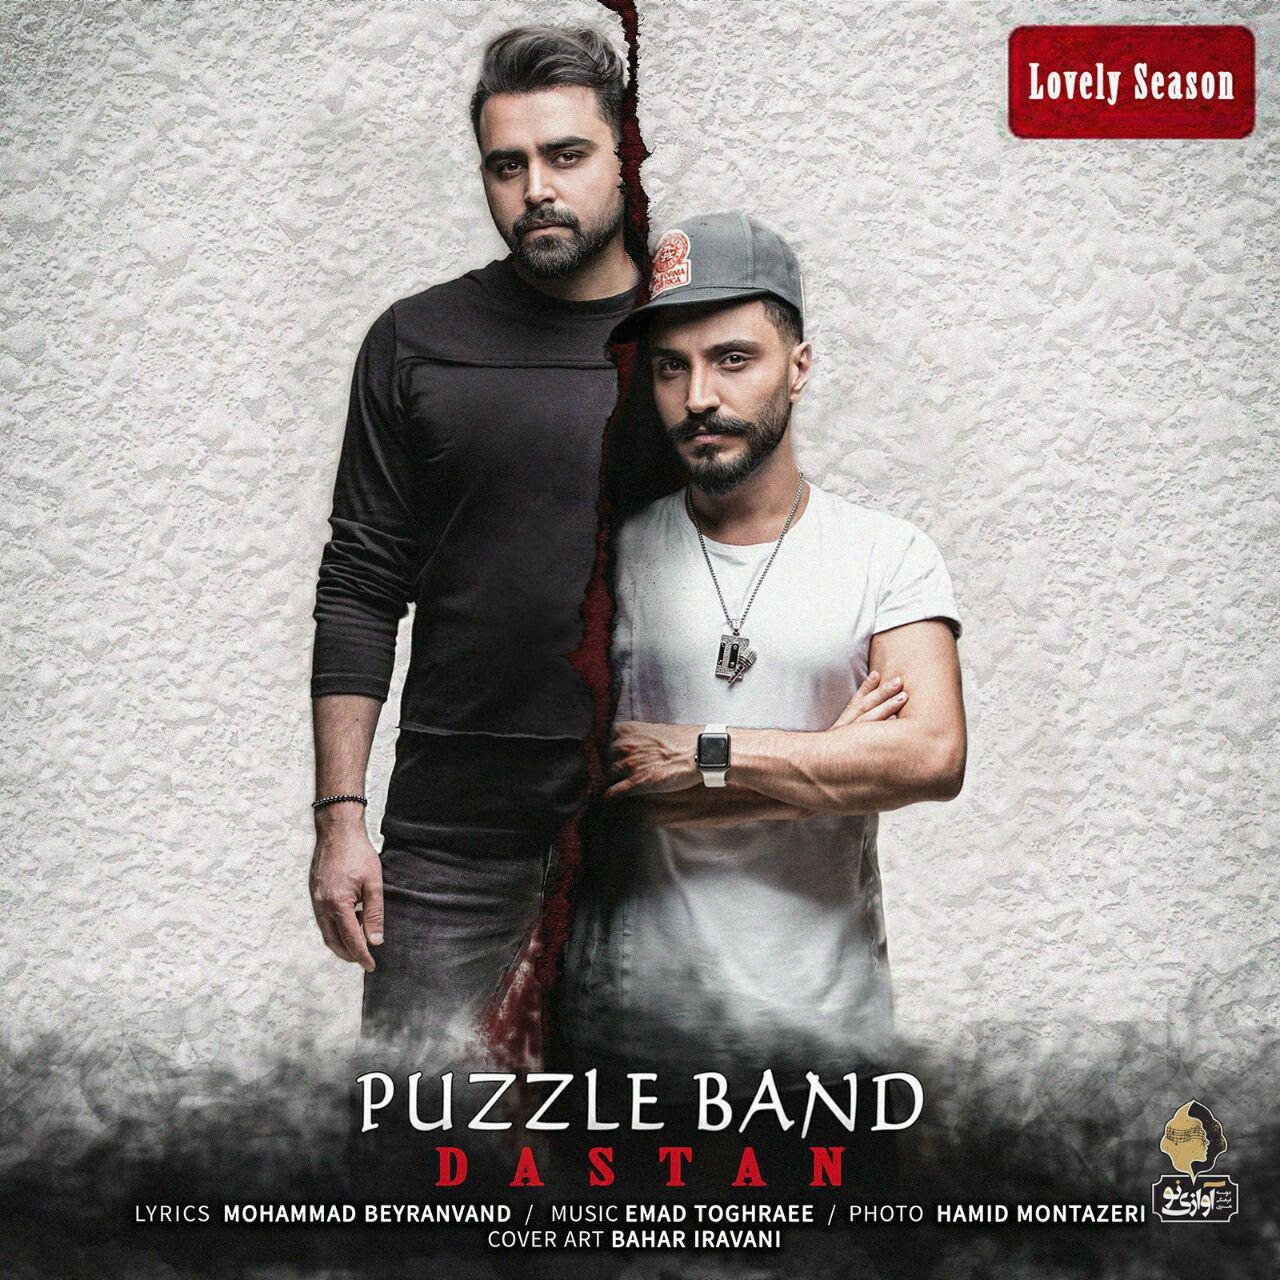 Puzzle Band – Dastan